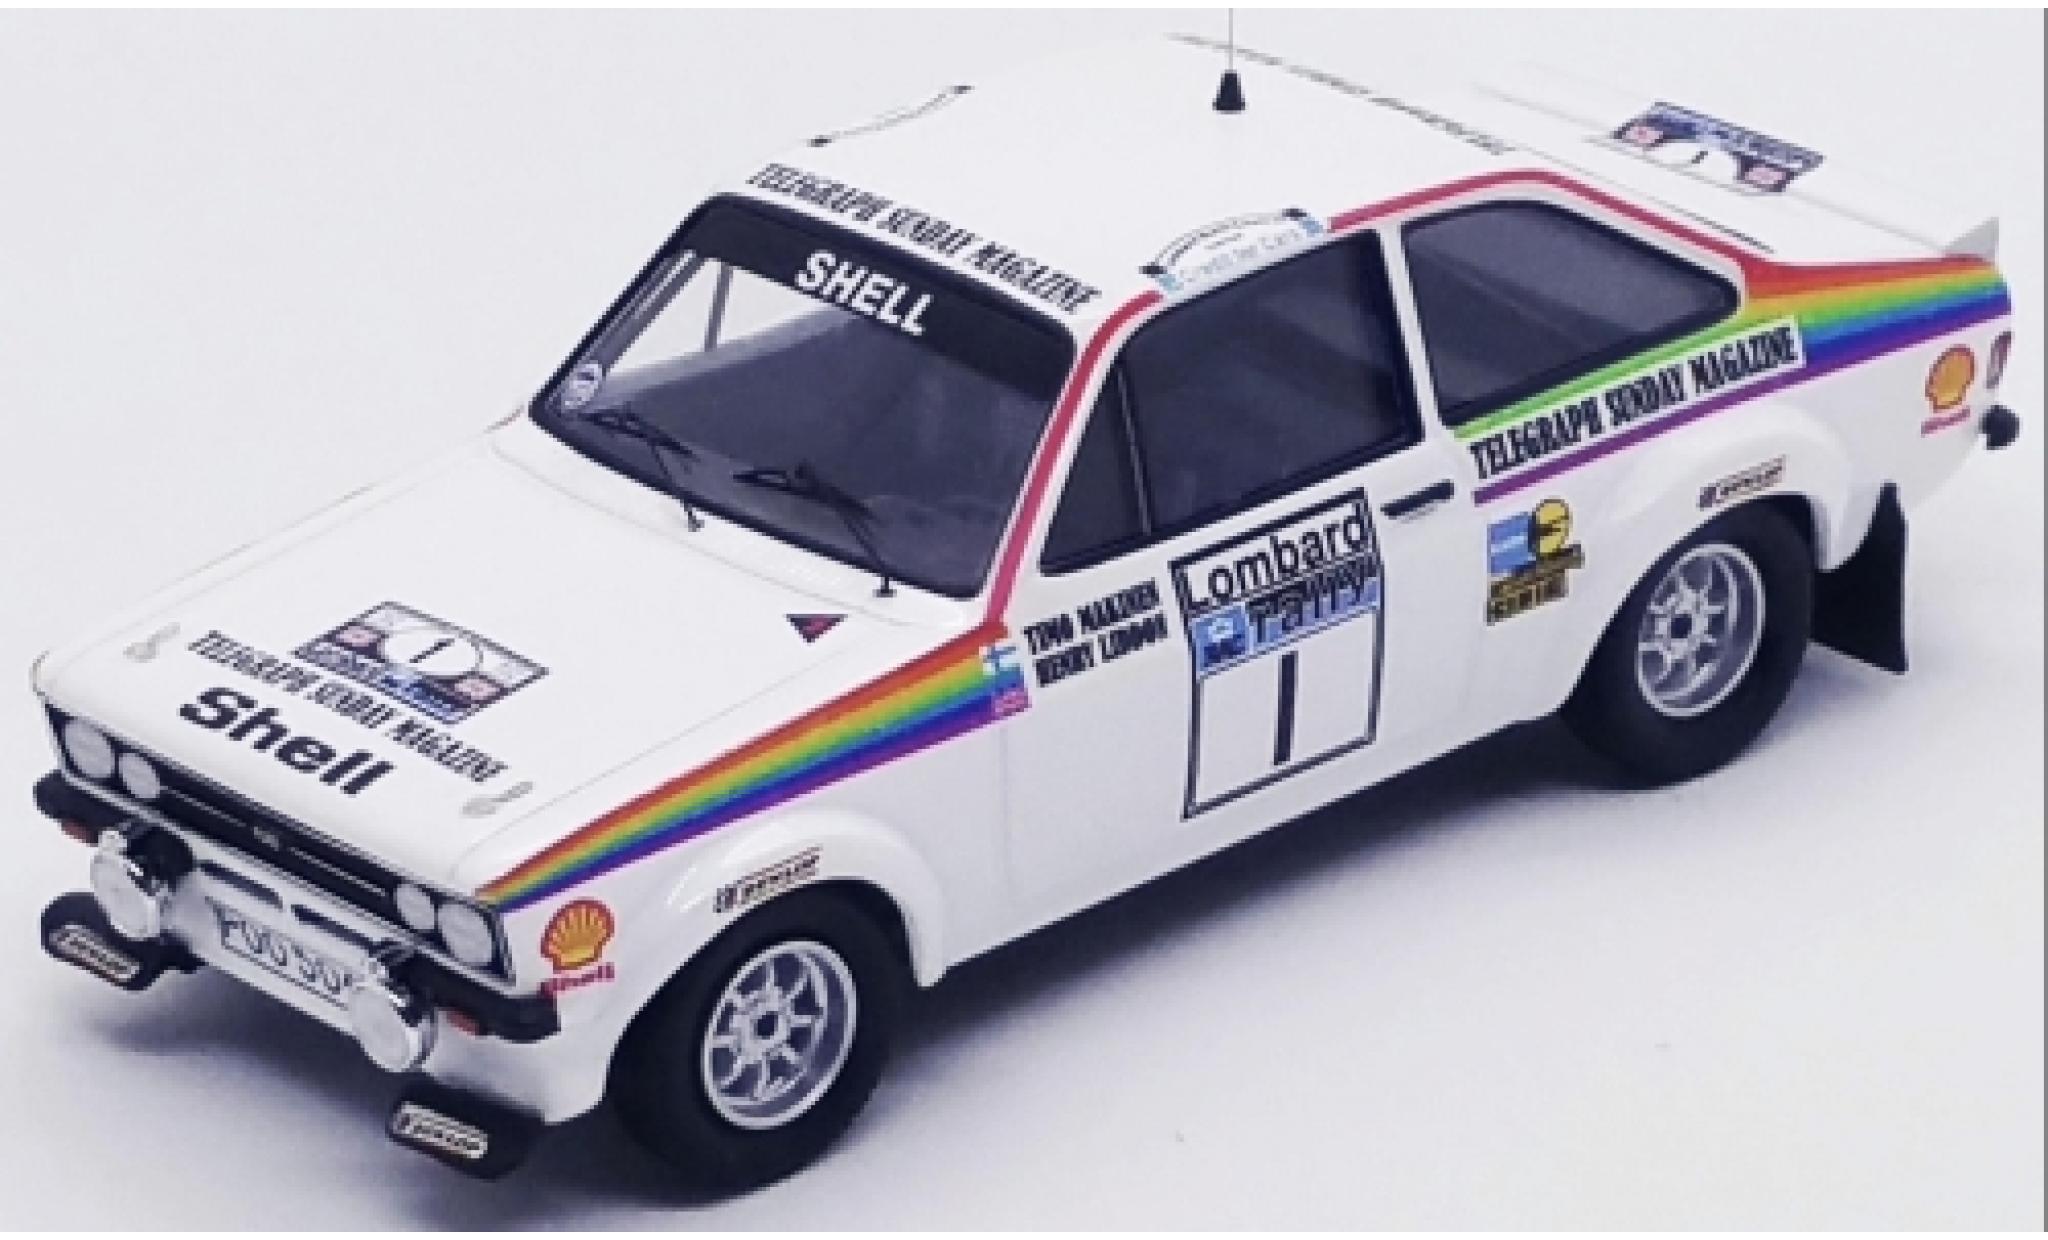 Ford Escort 1/43 Trofeu MK II RS 1800 No.1 Rallye WM RAC Rallye 1976 T.Makinen/H.Liddon